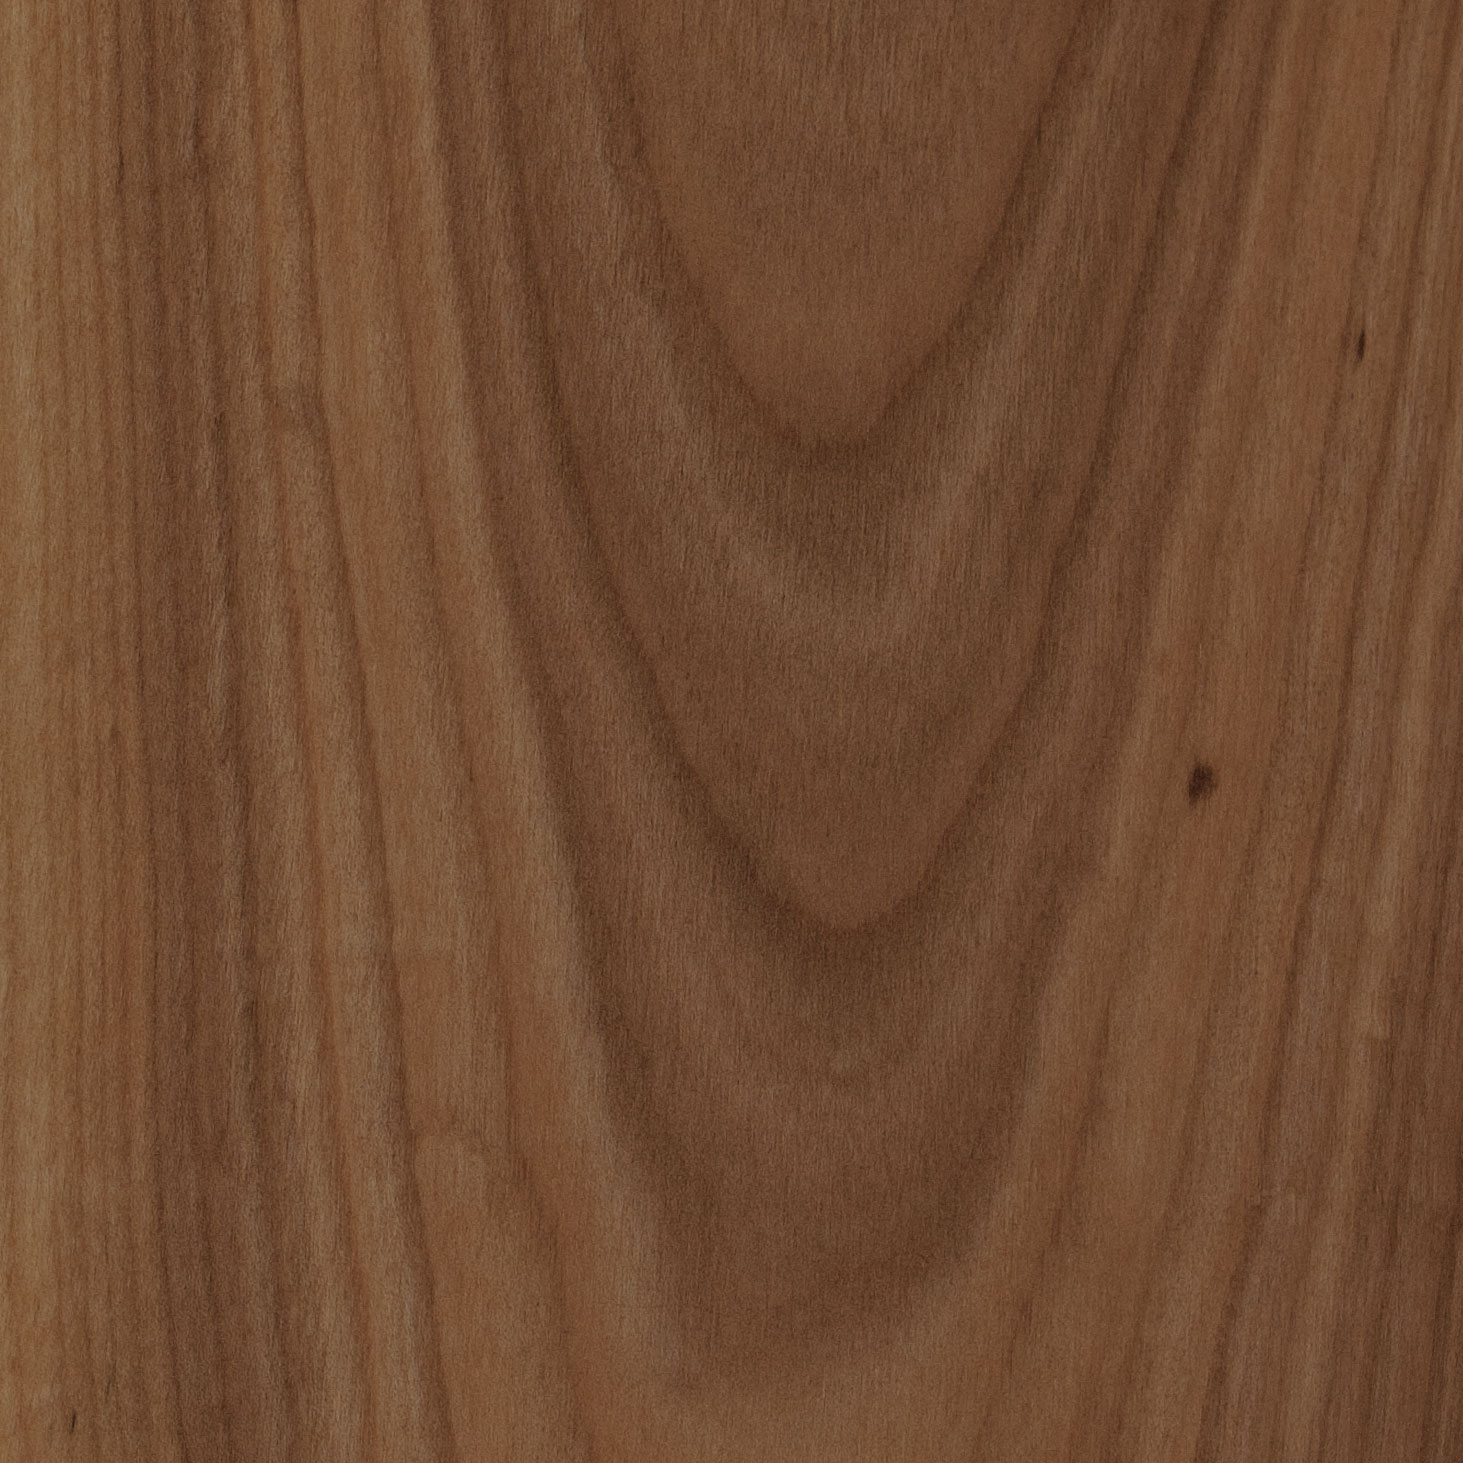 Element7-wide-plank-samples-american-cherry-IMG_9151_CMYK